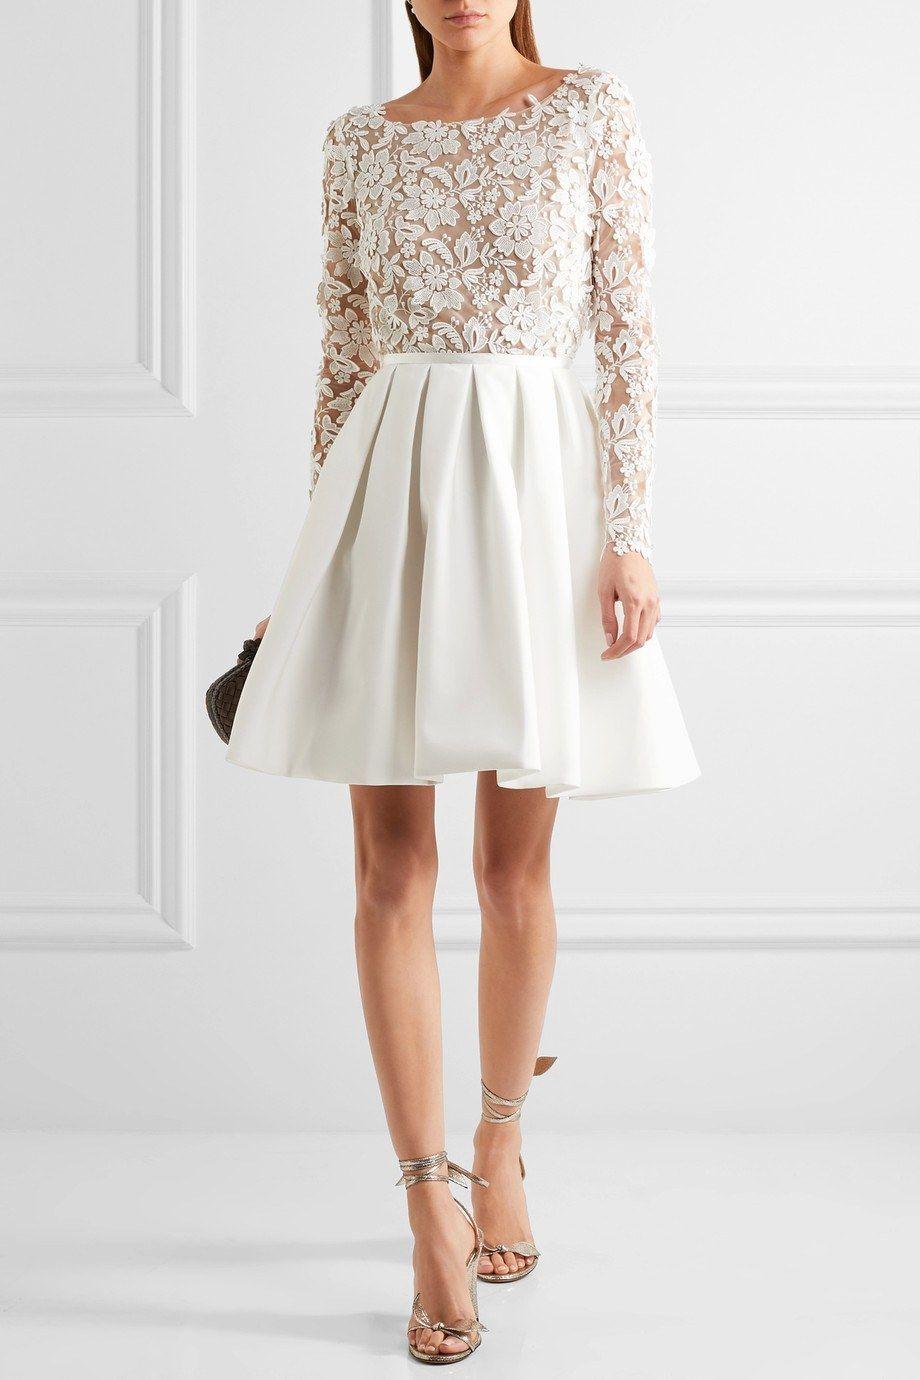 short wedding dresses you can buy now brides short wedding